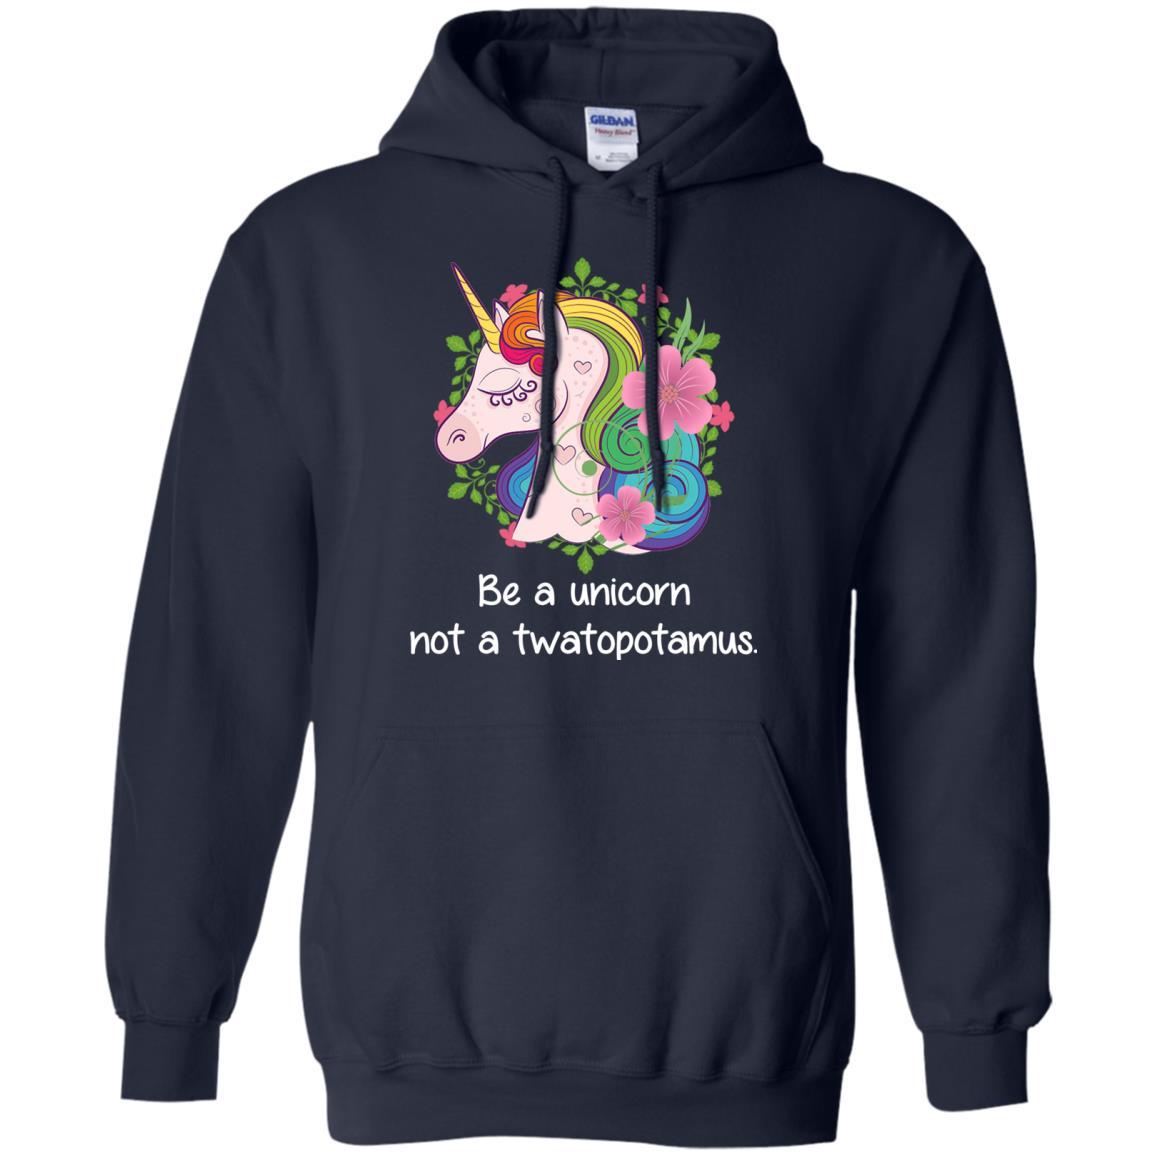 image 413 - Be a Unicorn Not a Twatopotamus Shirt, Sweatshirt, Hoodie